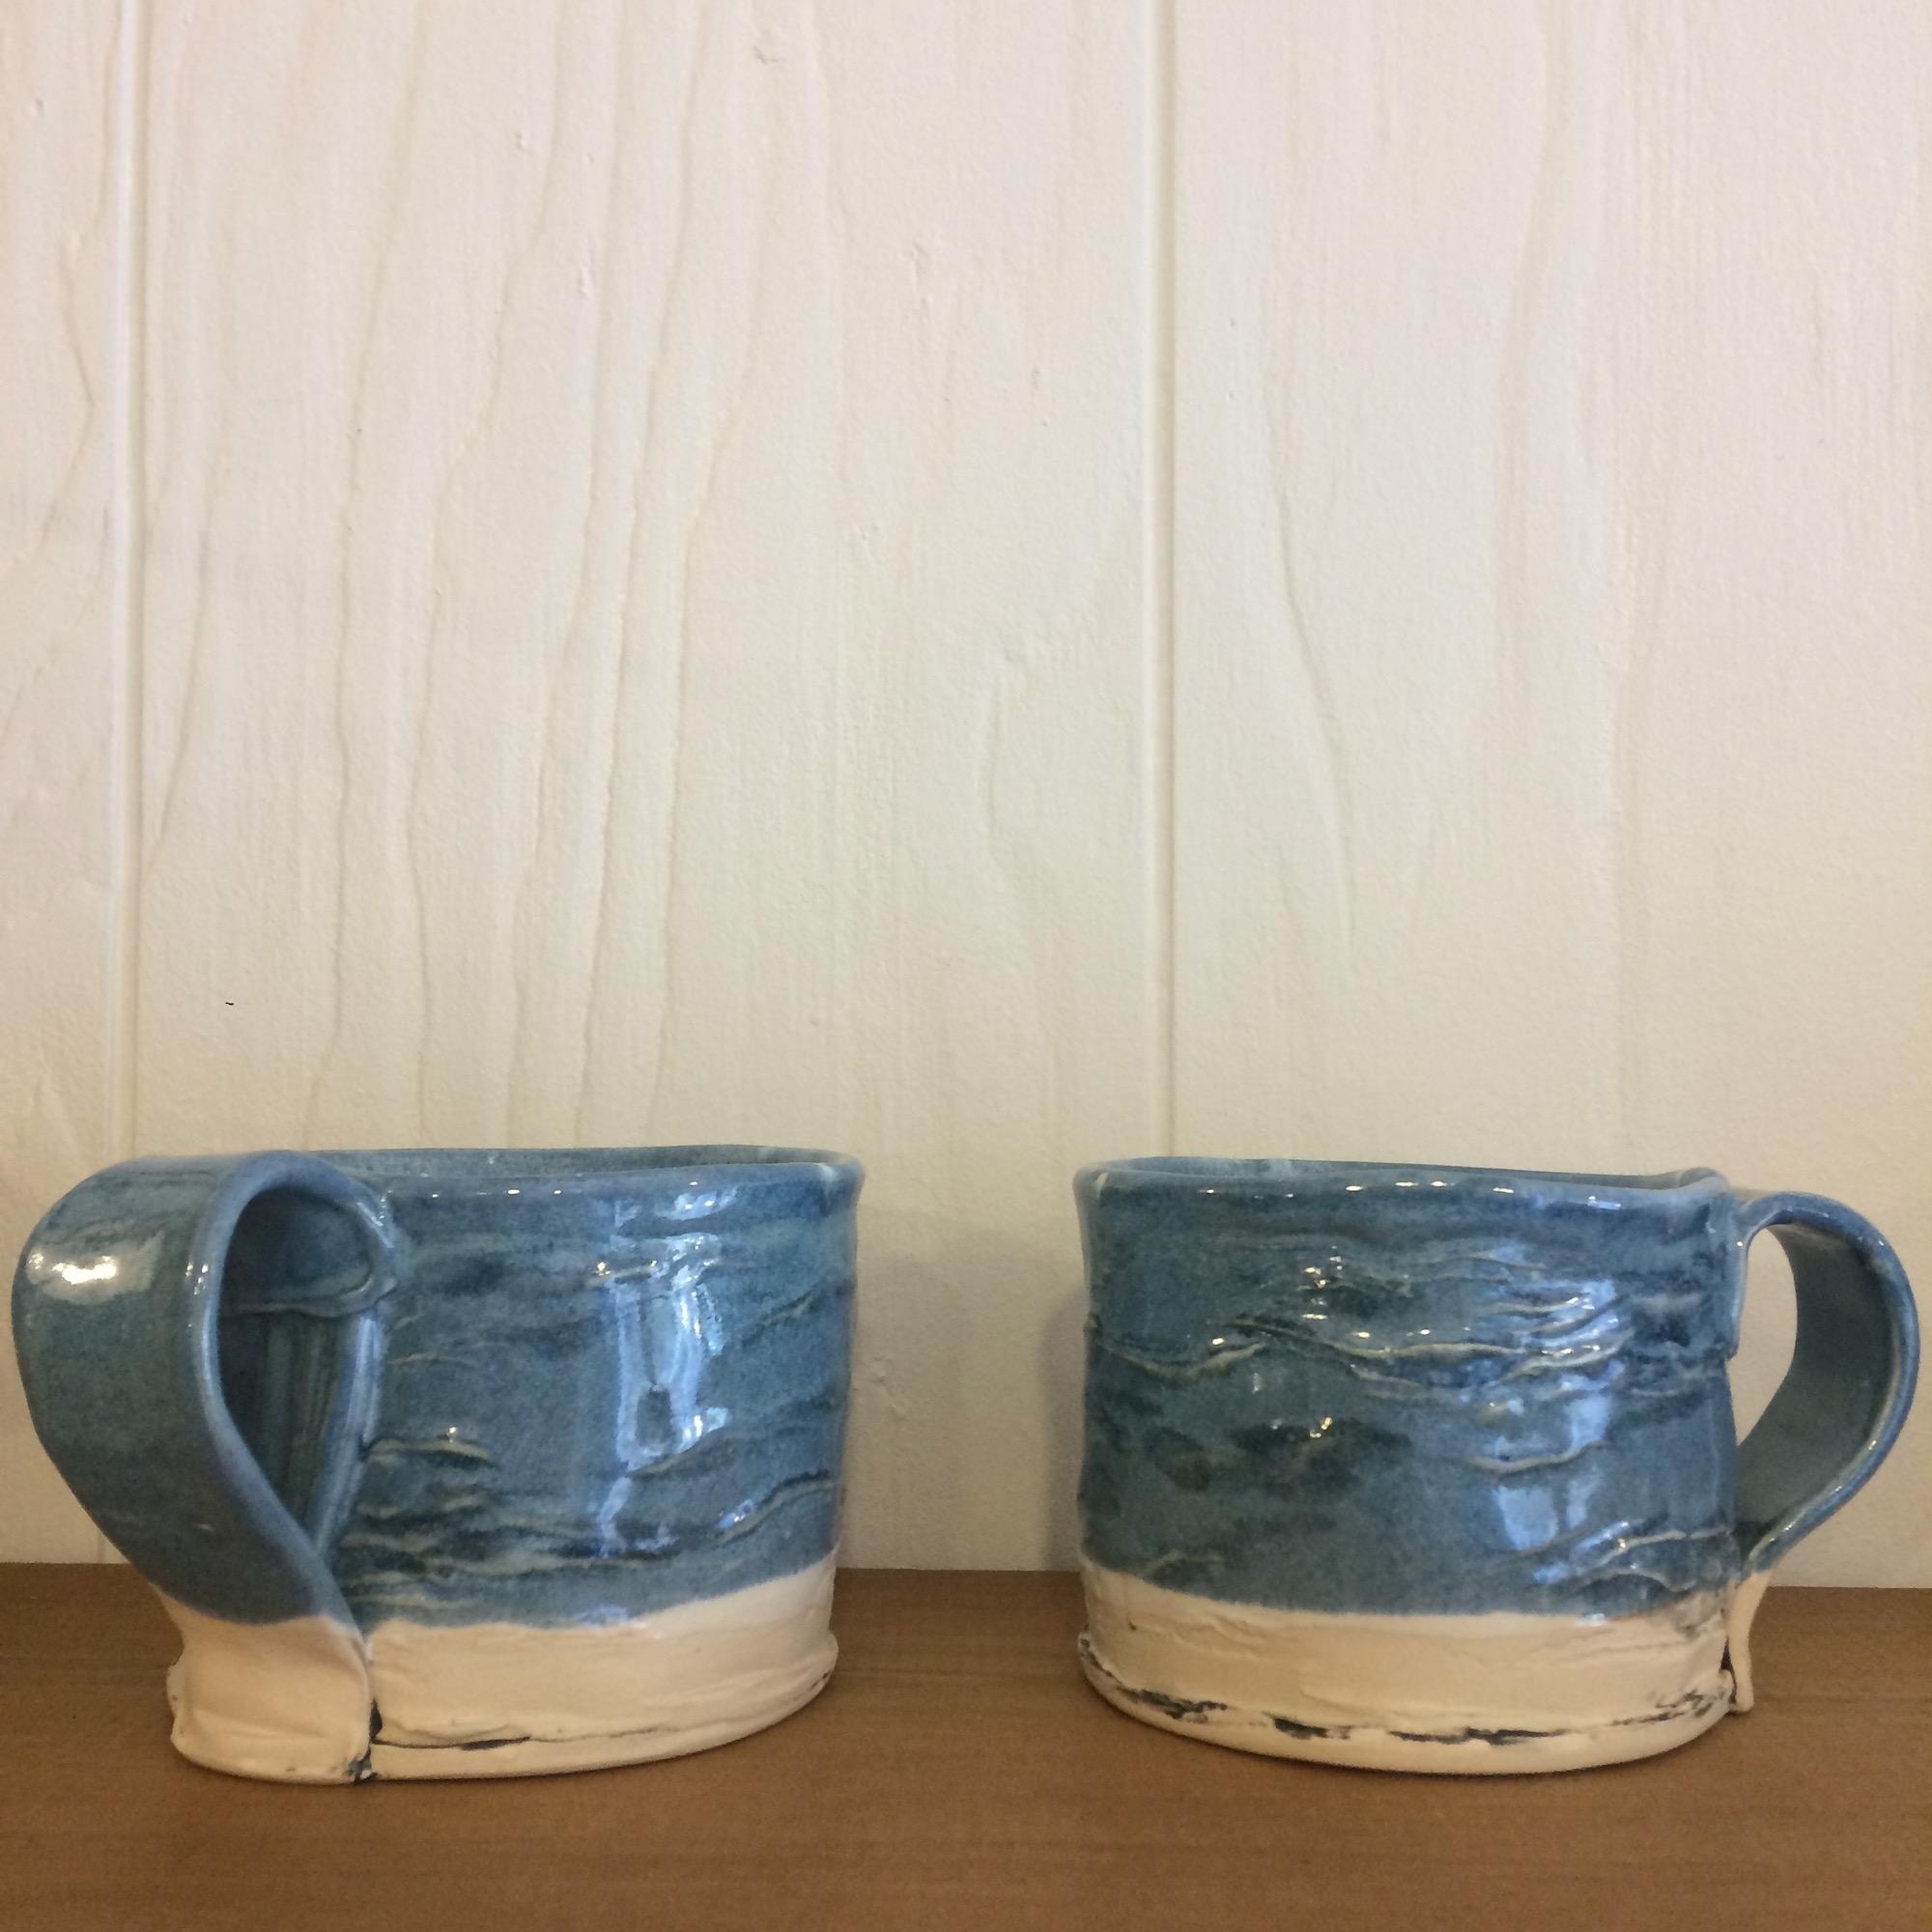 Handmade Lido Mug by Fiona Veacock